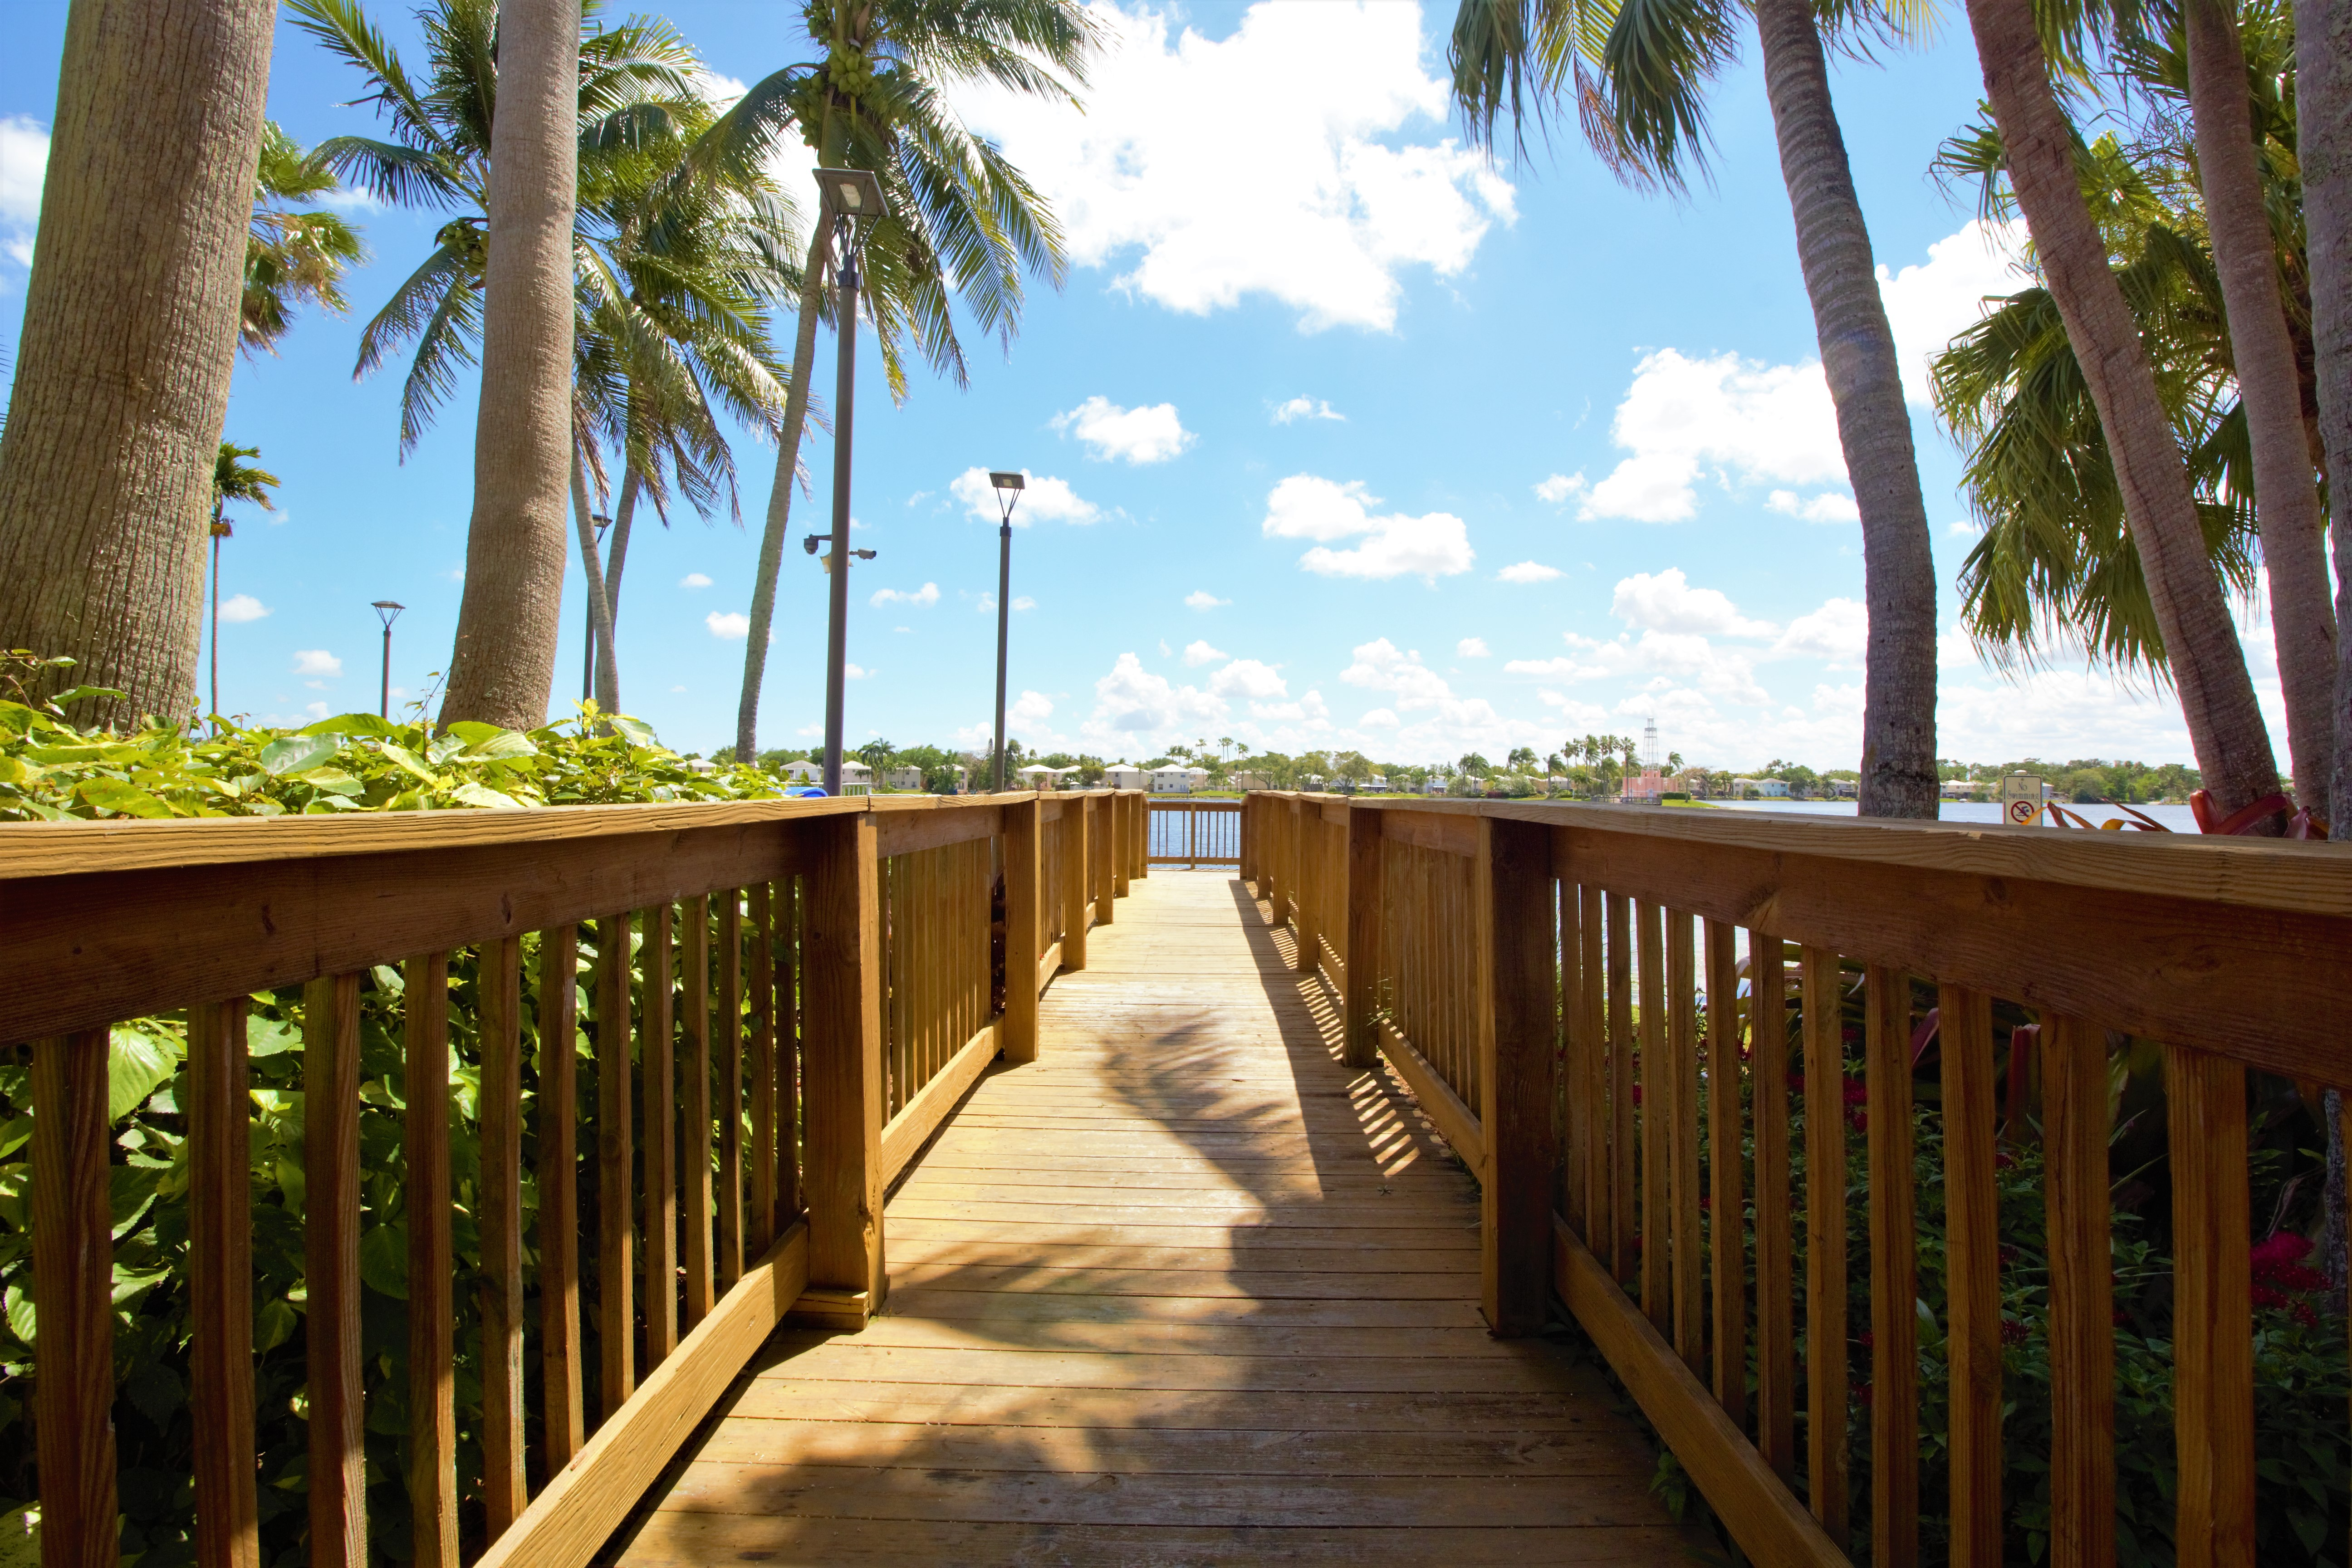 Coral Bay Broadwalk